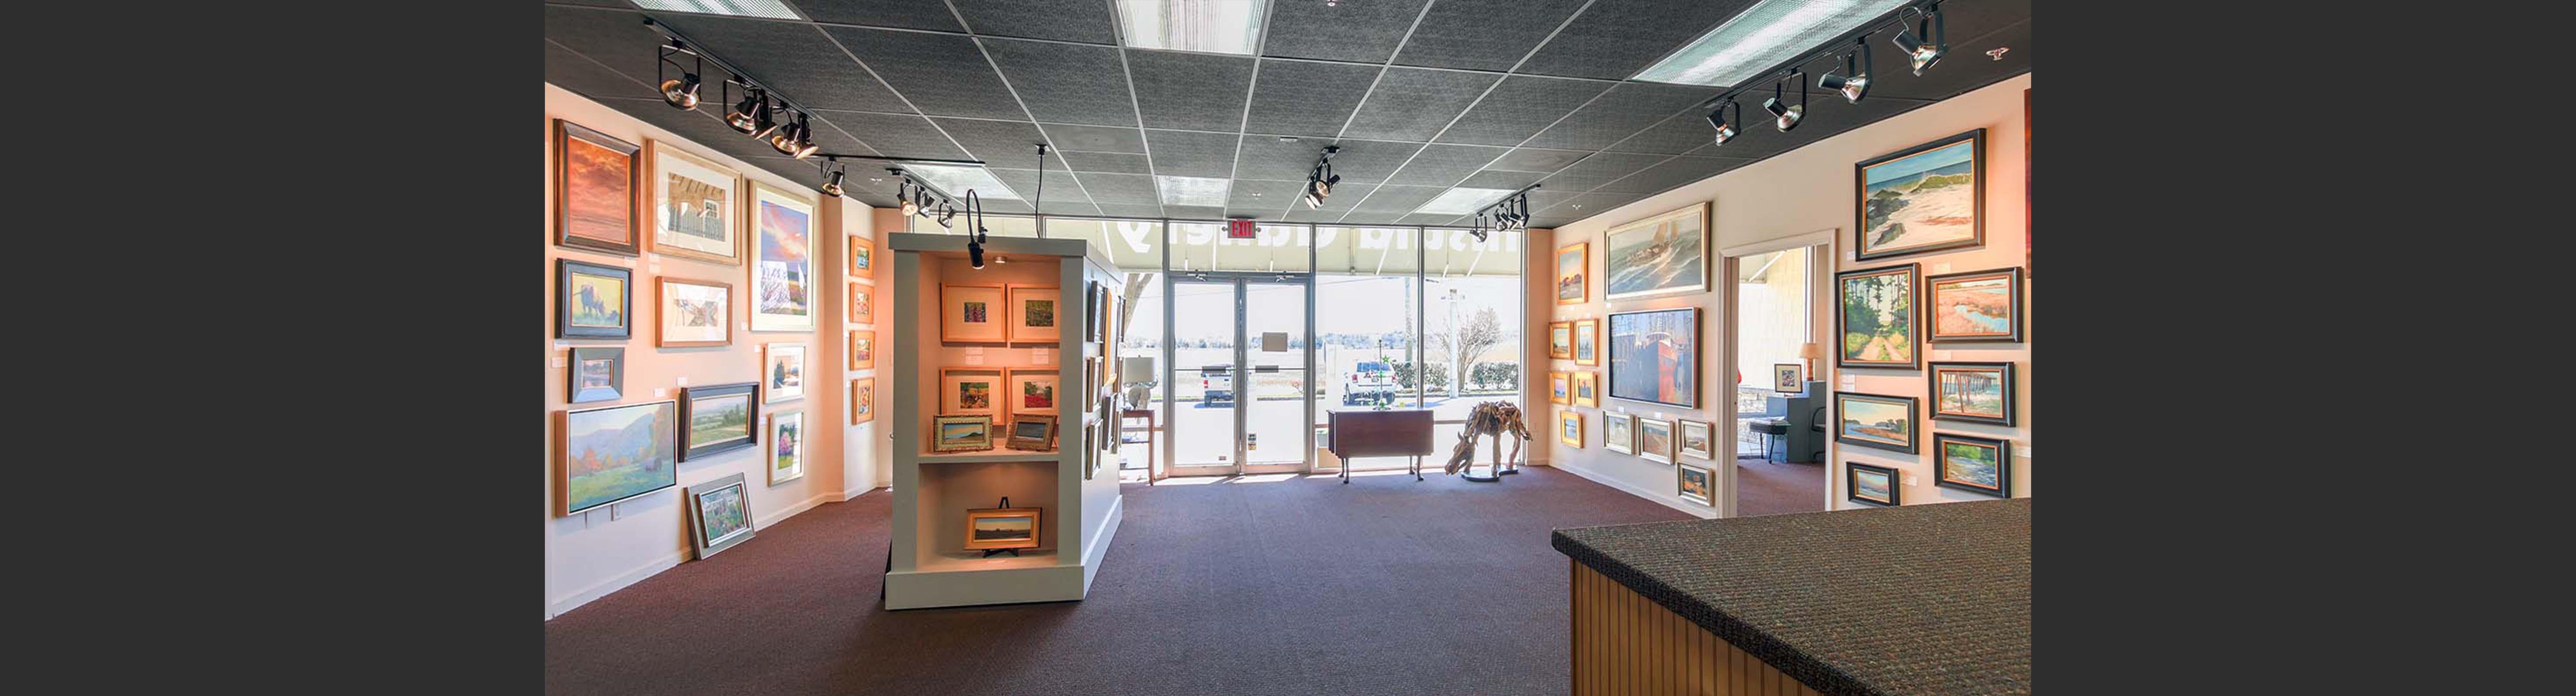 Fine Art and Custom Framing in Lewes, Delaware